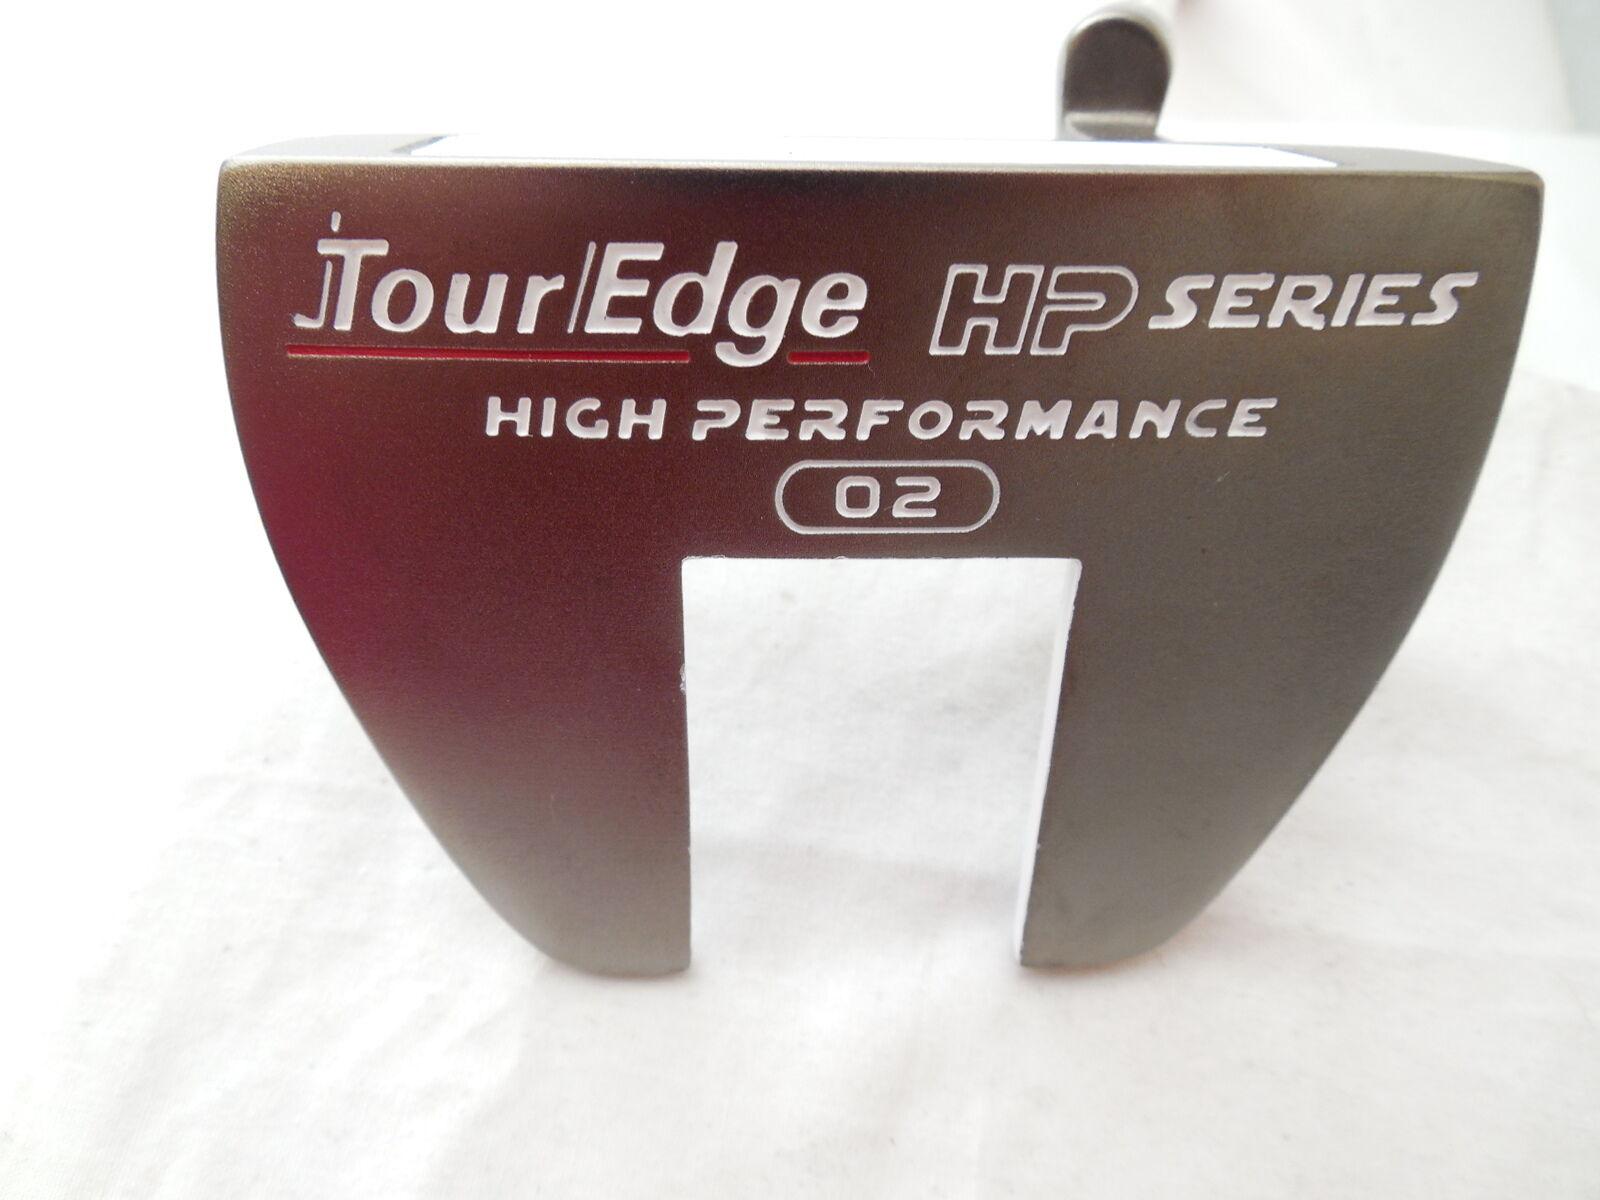 Tour Edge  Usado Hp Serie 02 34  Putter RH  Envio gratis en todas las ordenes